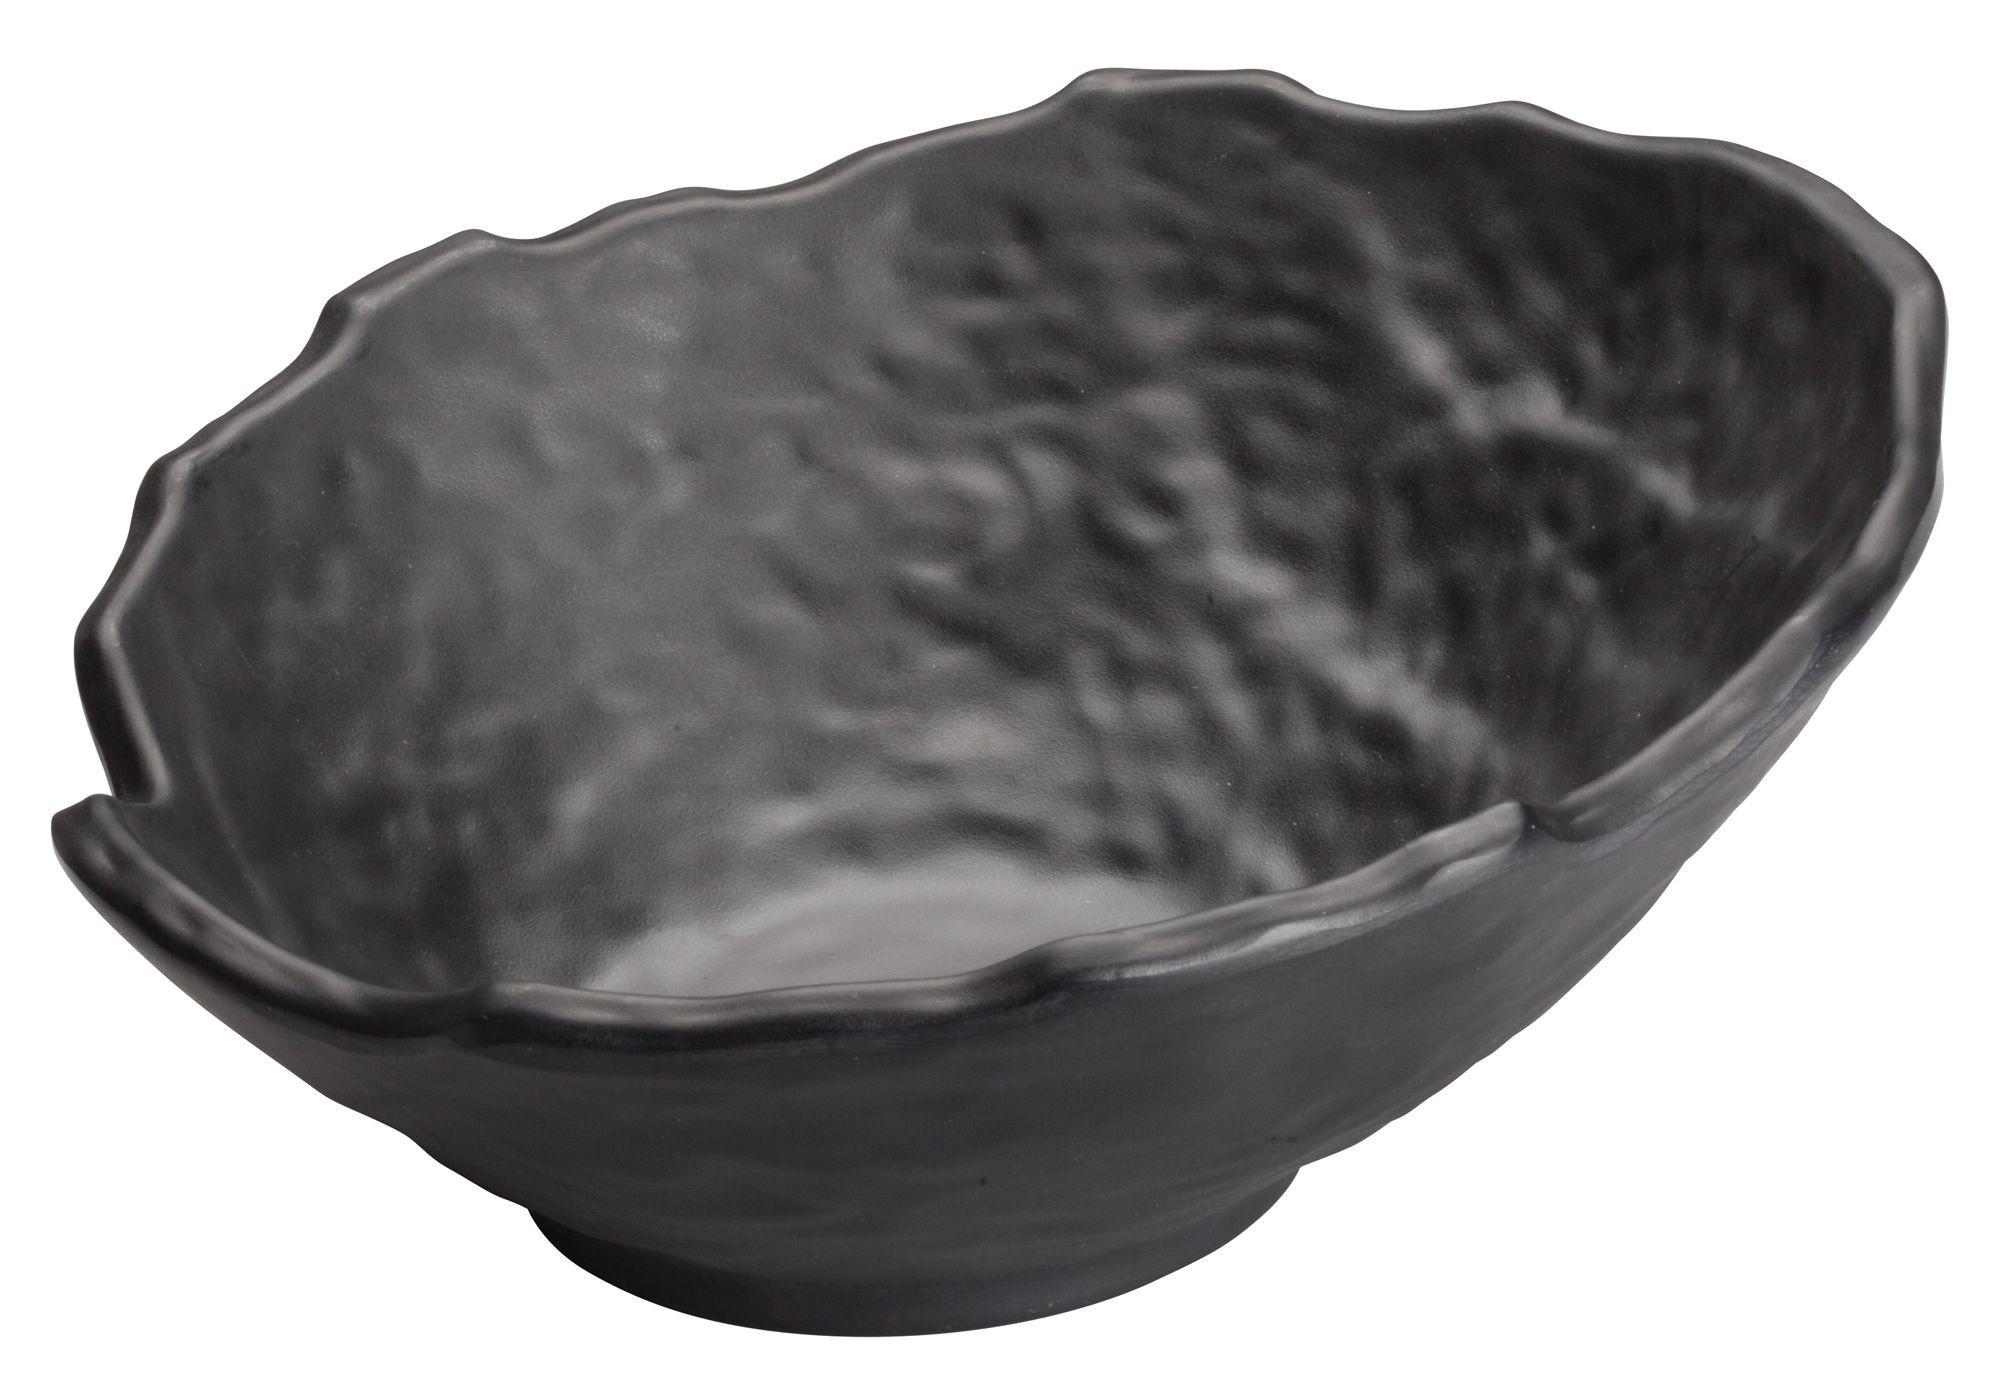 "Winco WDM019-308 Kaori Black Melamine Angled Bowl 9"" Dia."